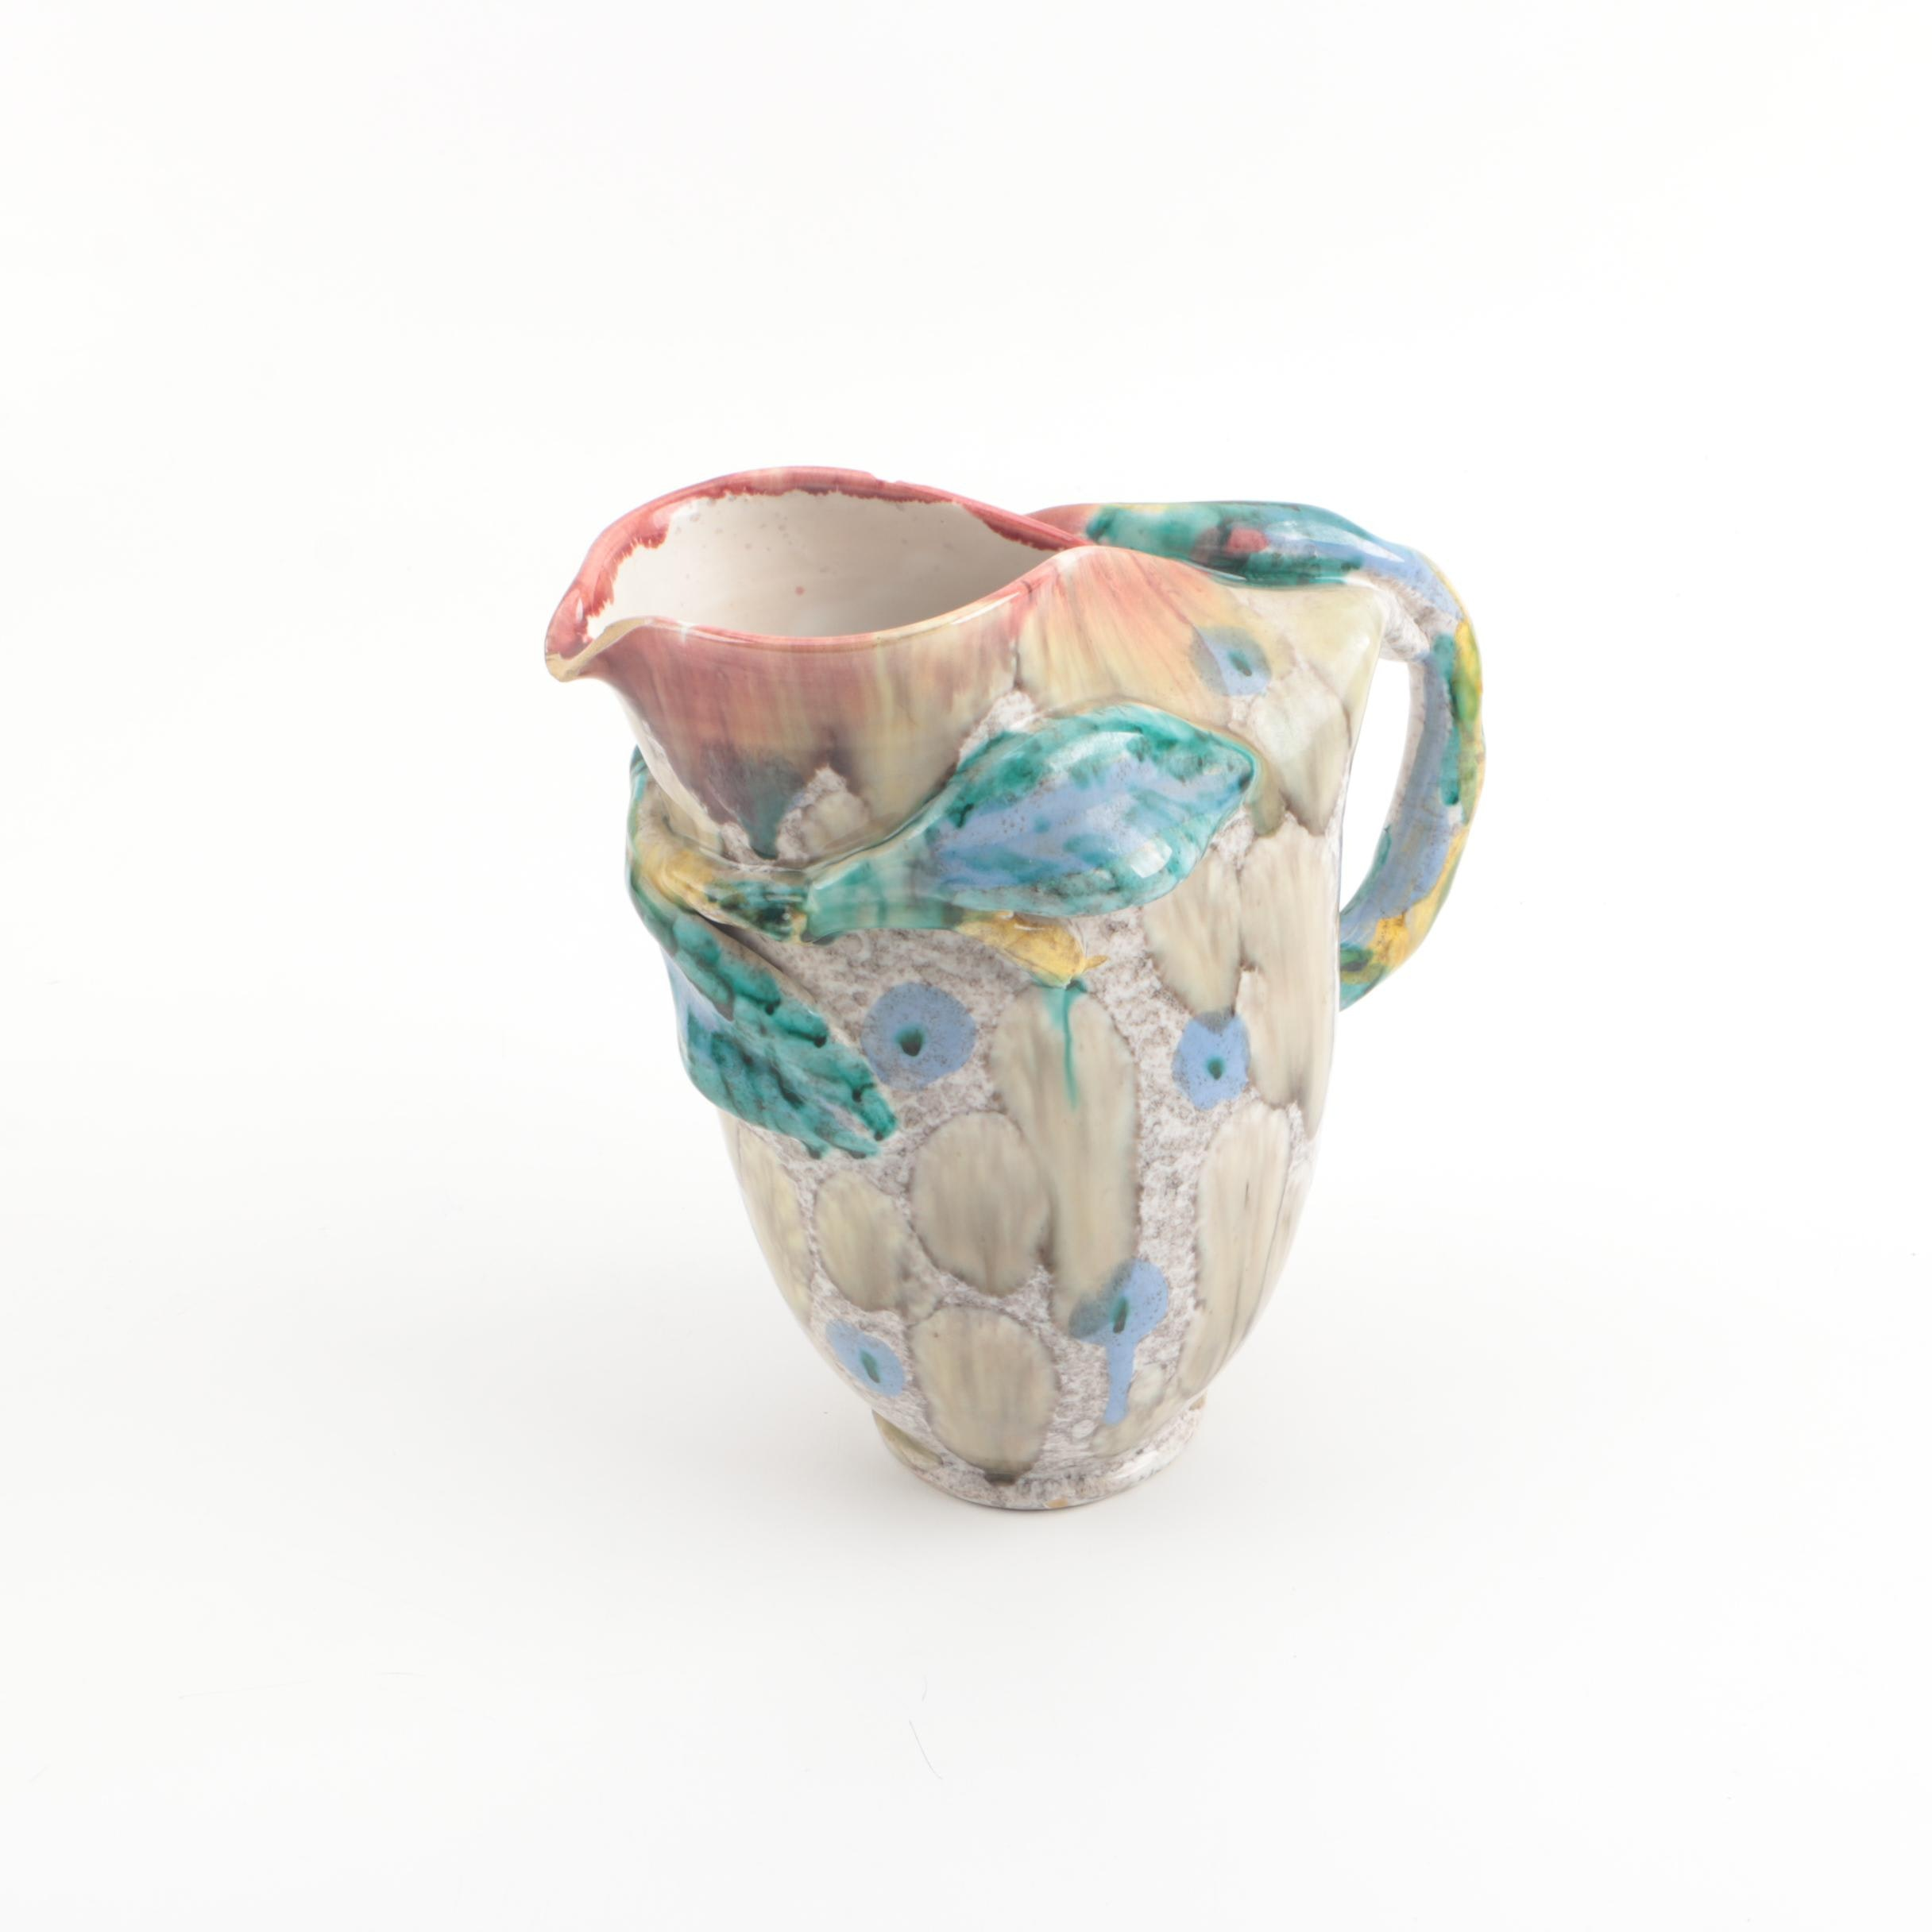 Vintage Italian Art Pottery Pitcher